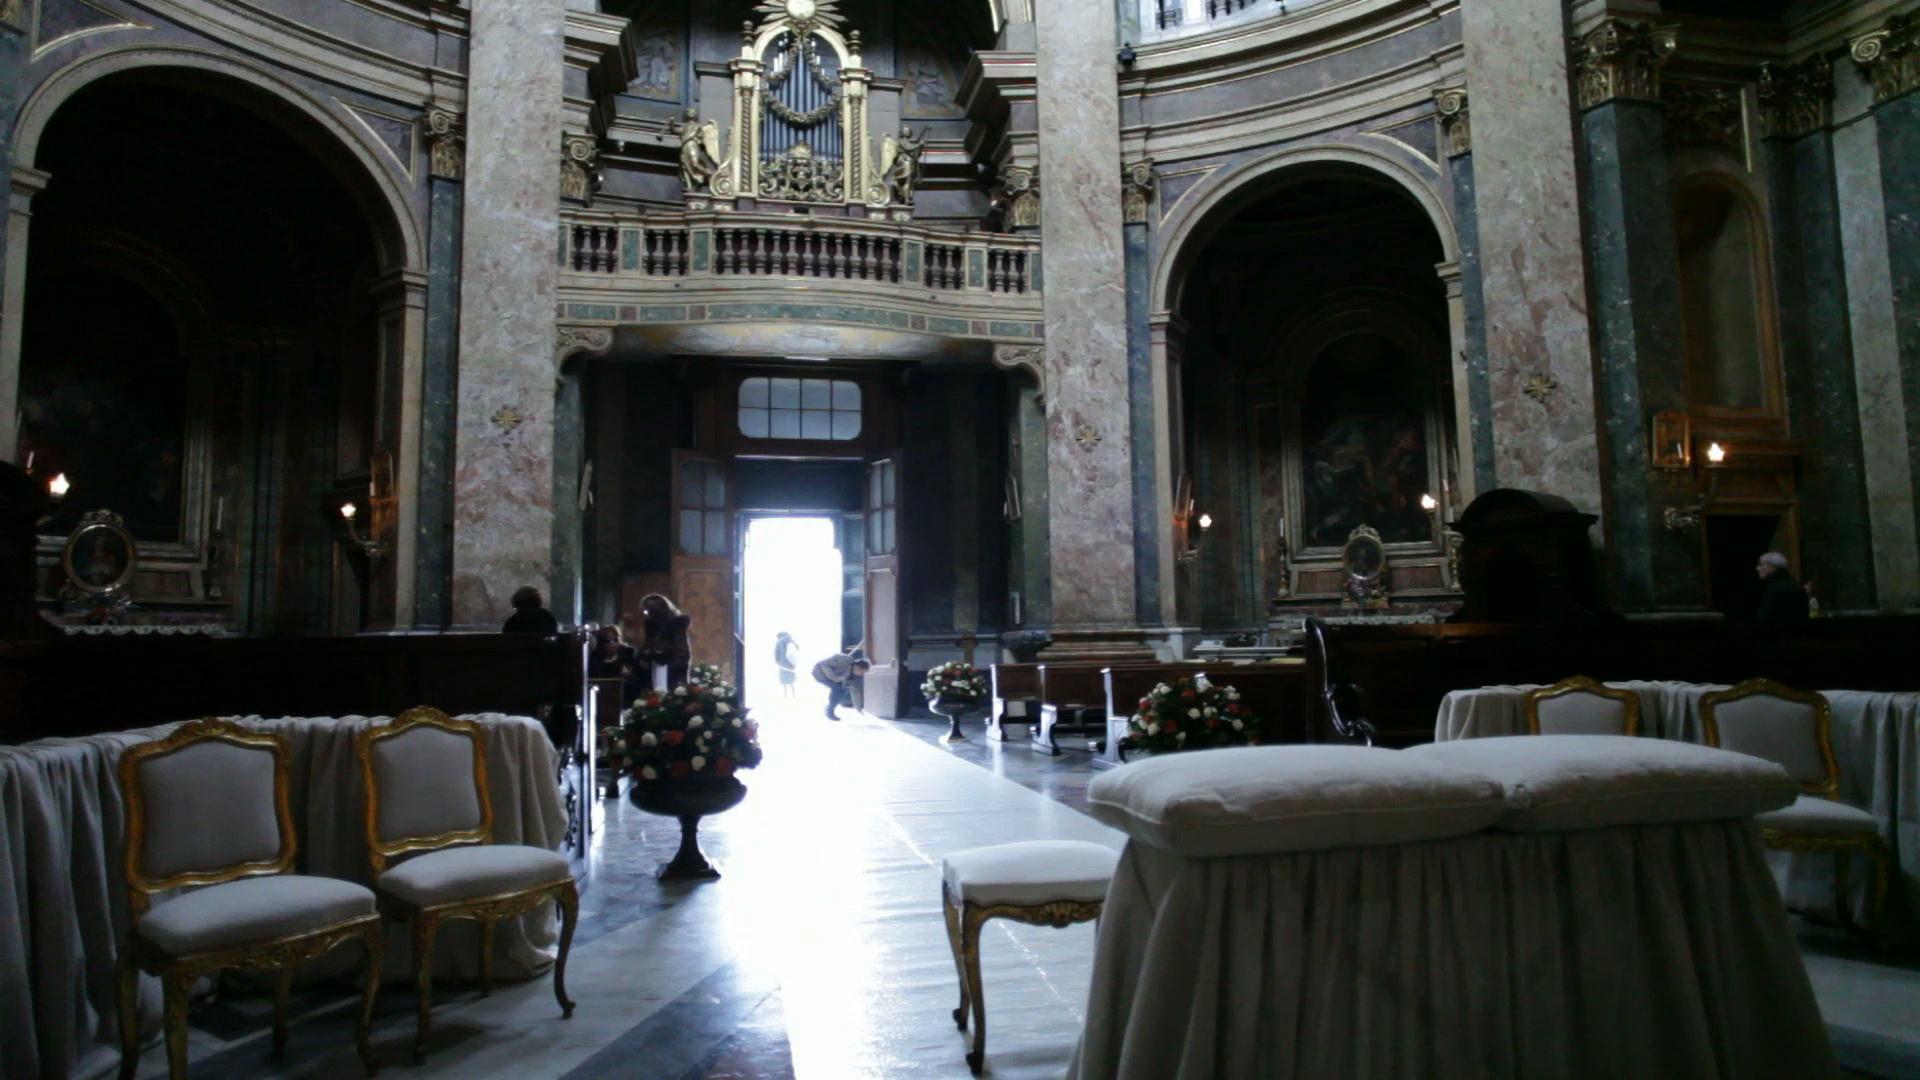 wedding rome galleria cardinale00003.jpeg